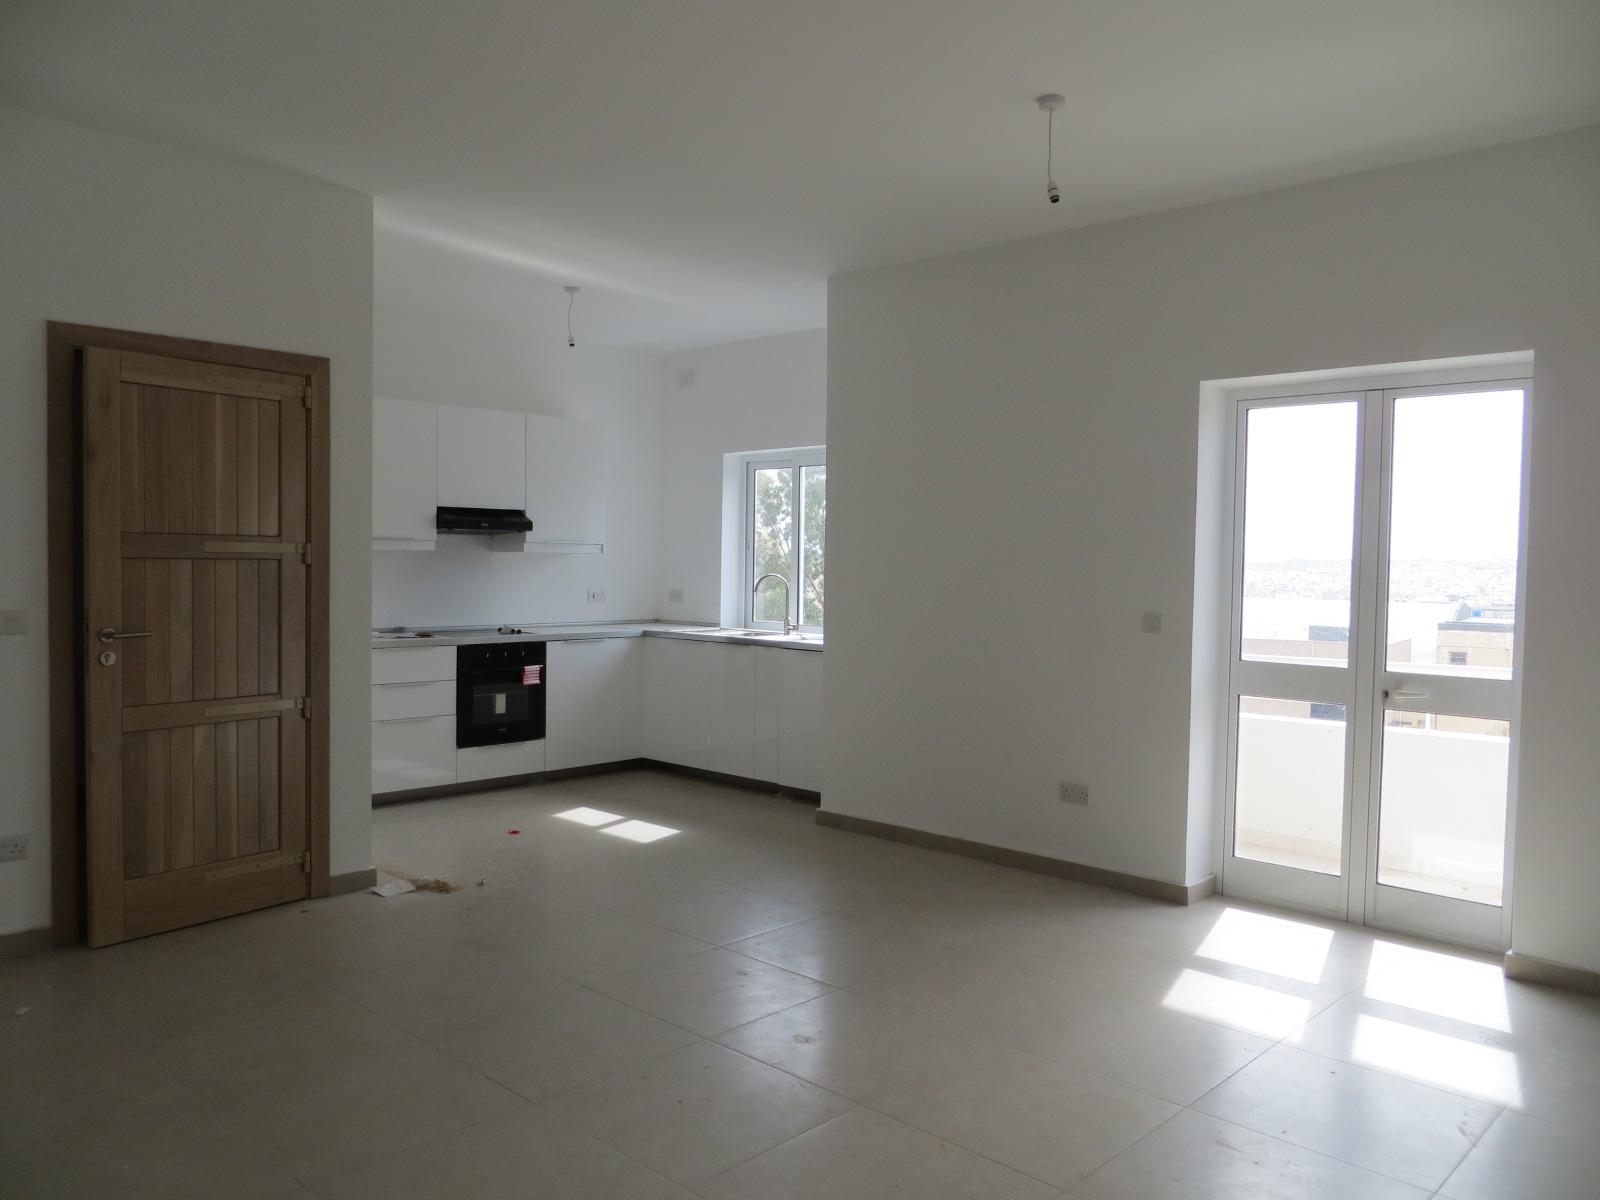 3-Bed Brand New Apartment in Mriehel, Malta